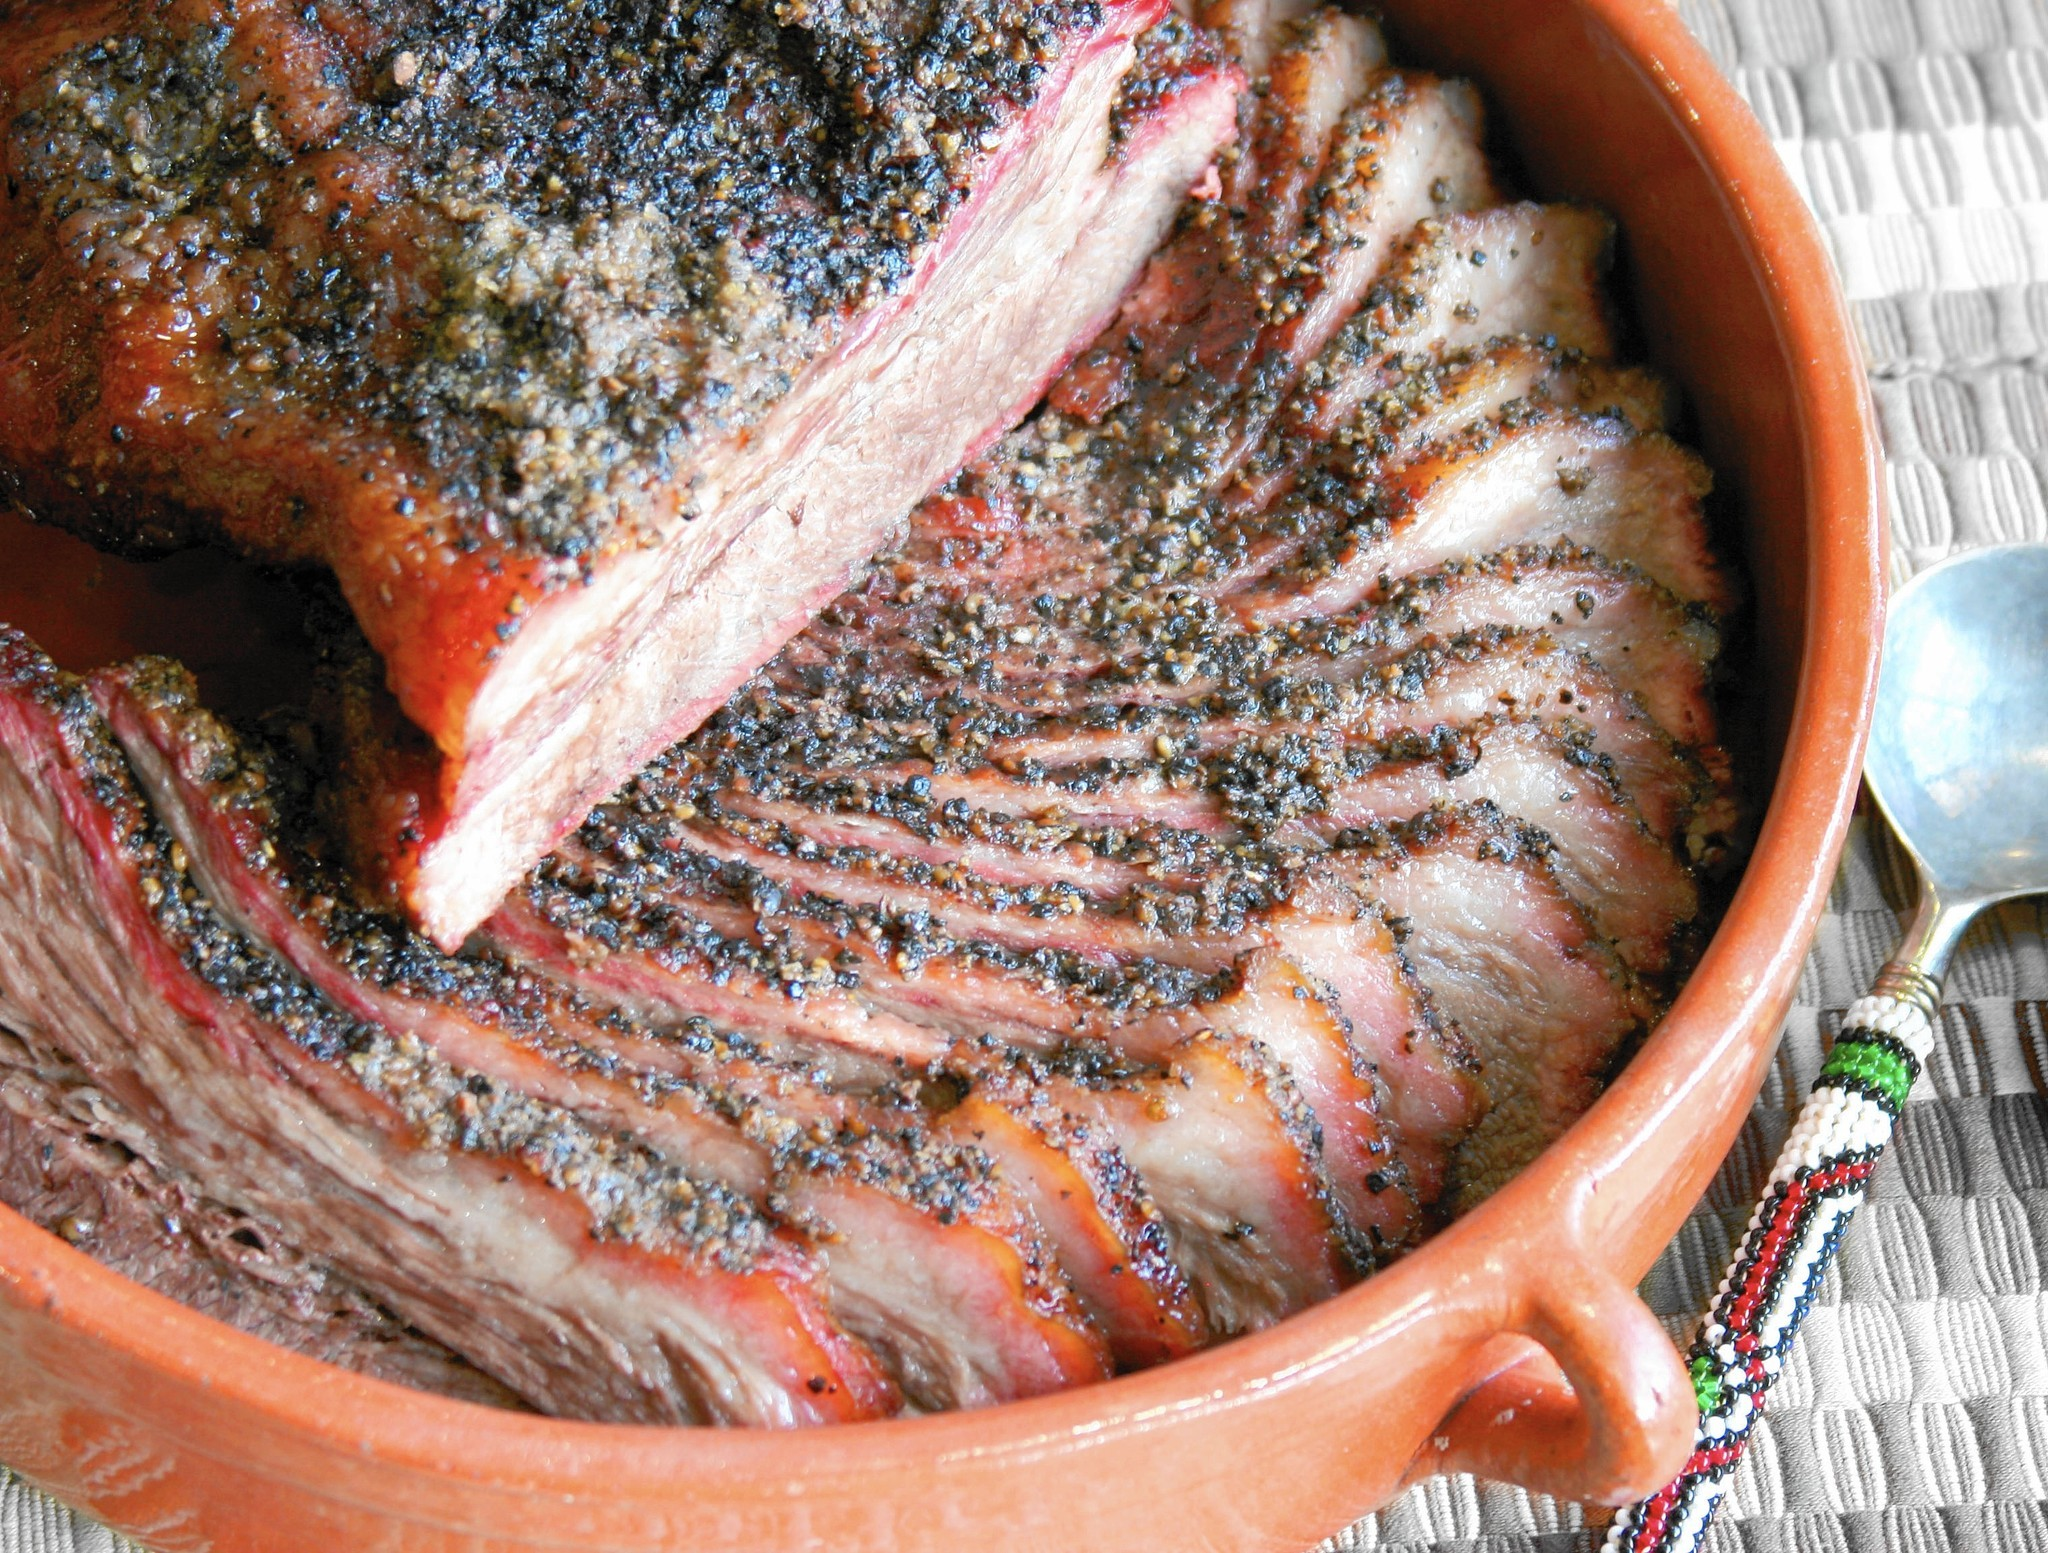 How to smoke brisket, the Texas crutch way